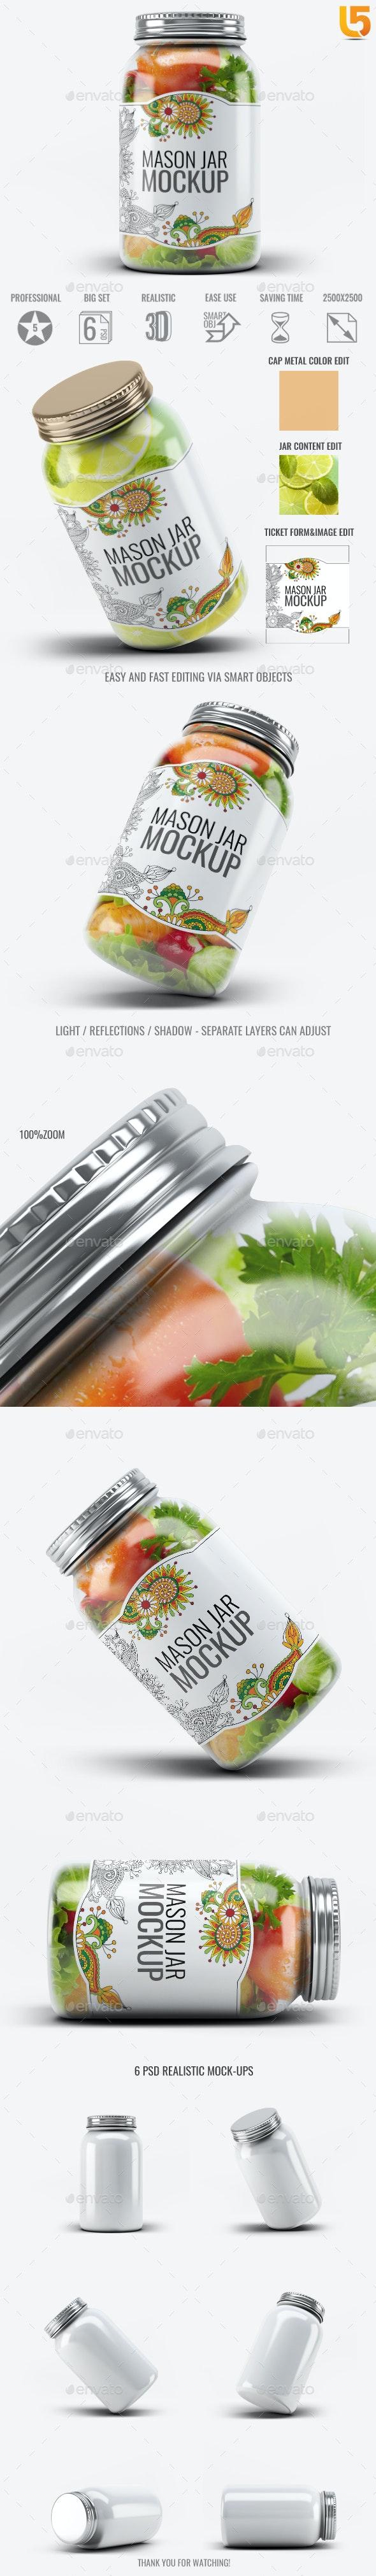 Mason Jar Mock-Up V.1 - Food and Drink Packaging